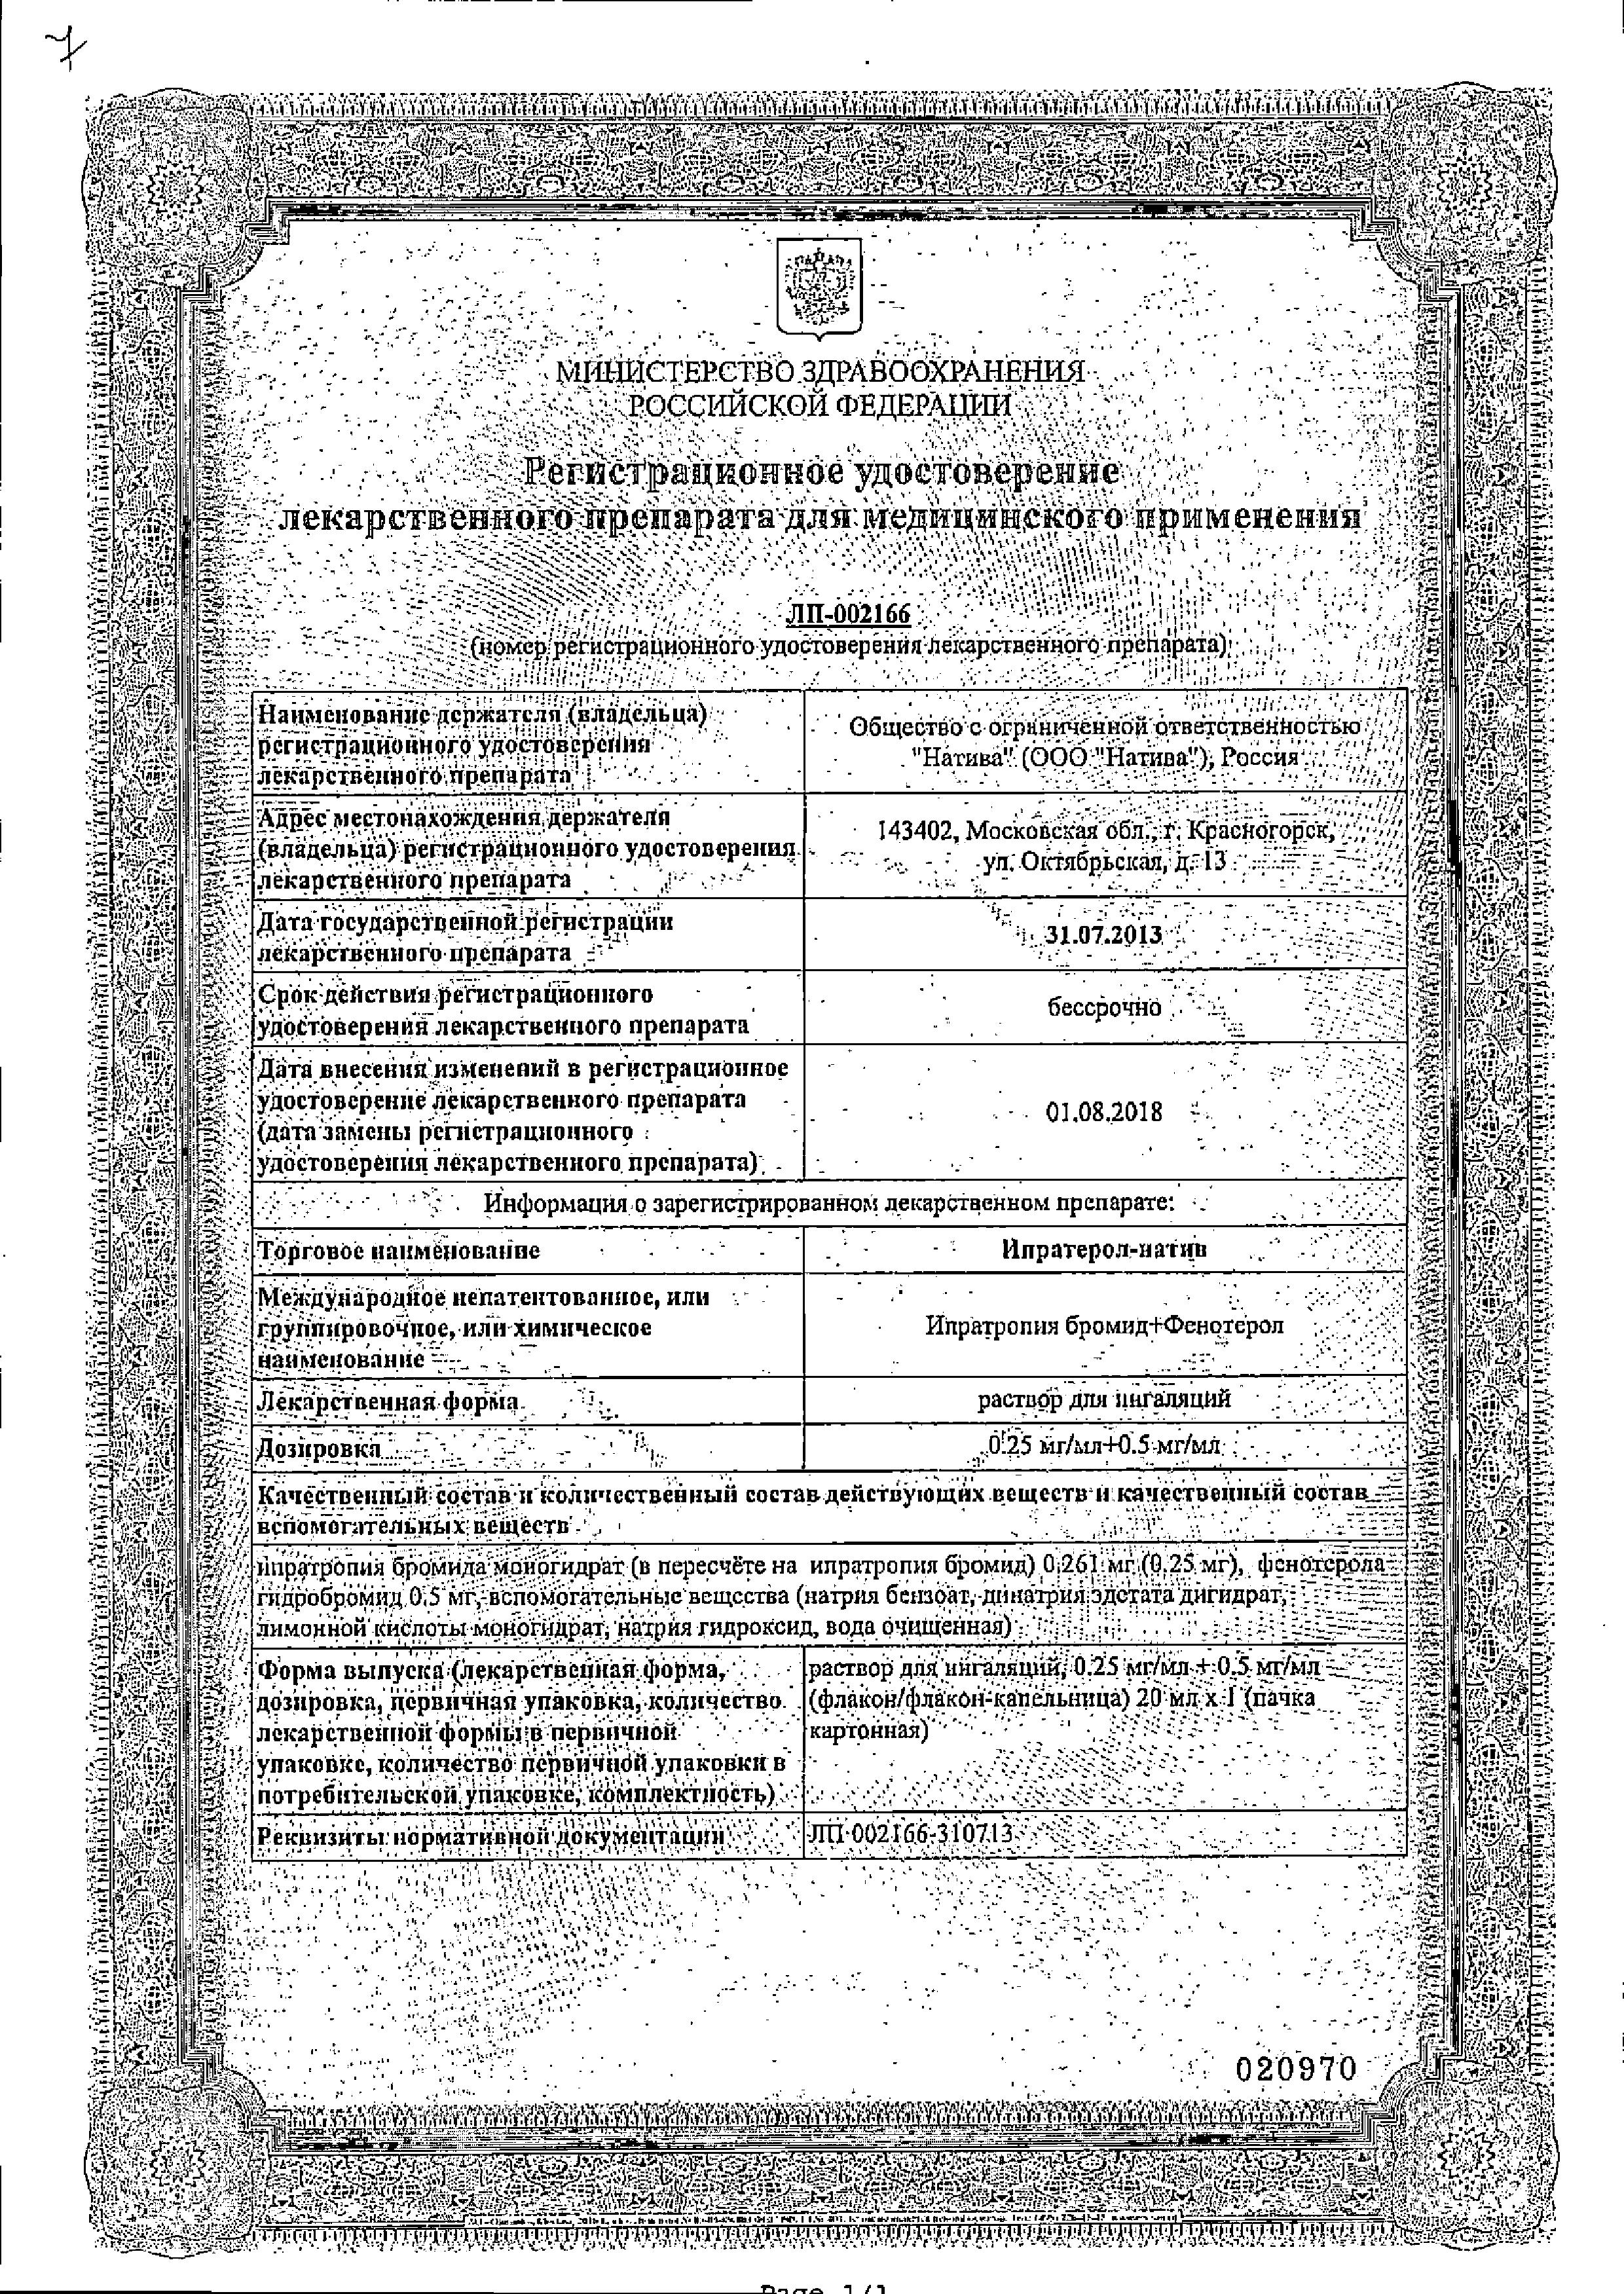 Ипратерол-натив сертификат